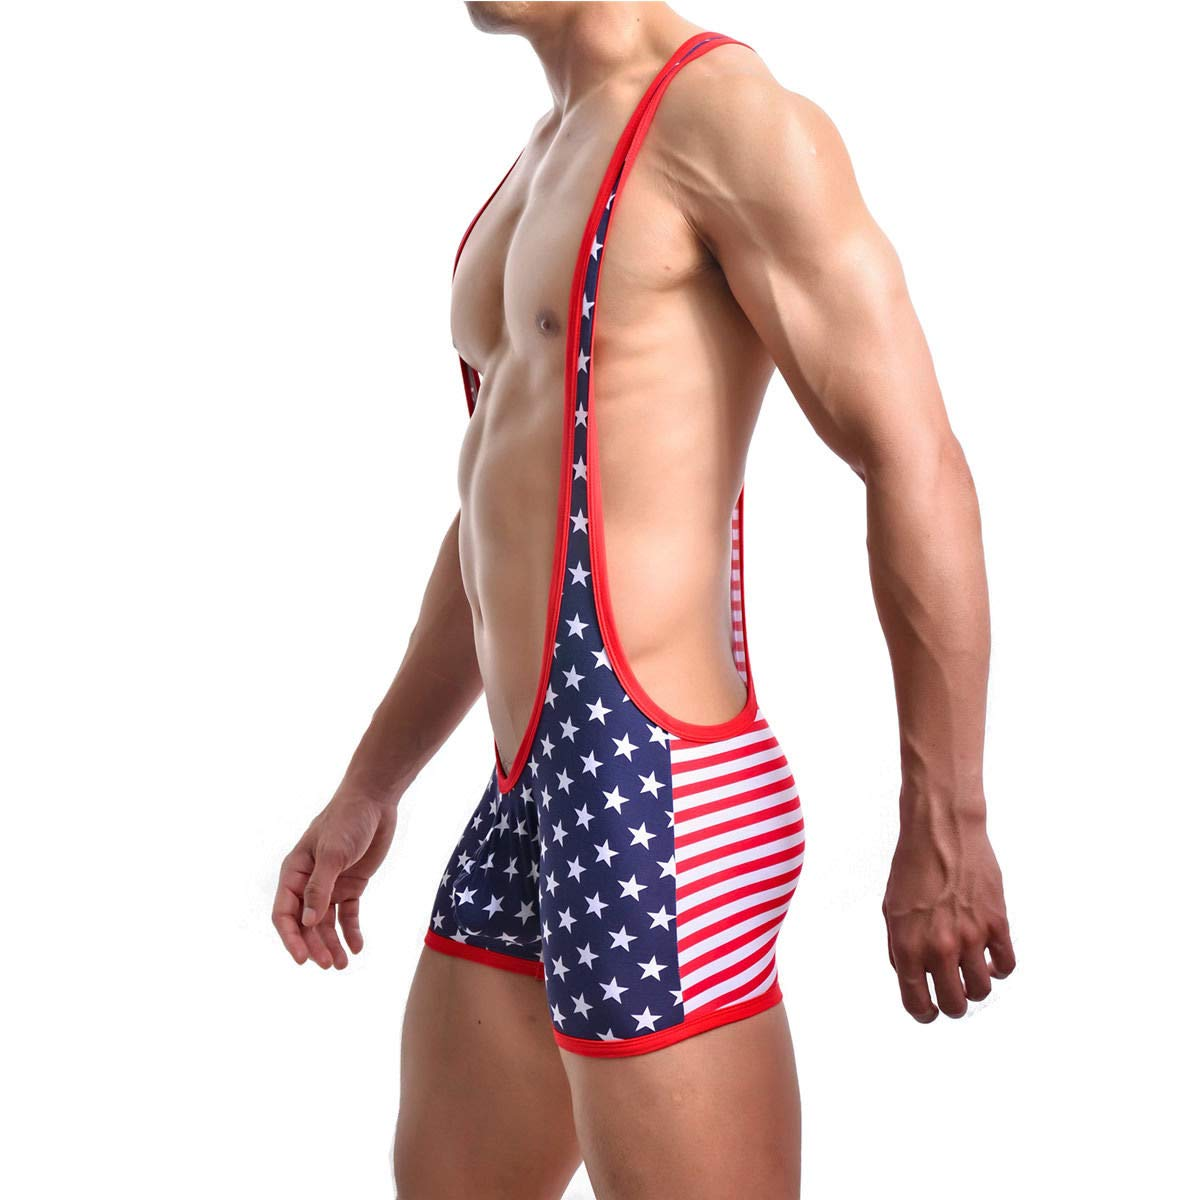 FidgetGear Sports Mens Wrestling Singlet Bodysuit American Flag Leotard Muscle Jumpsuit New M by FidgetGear